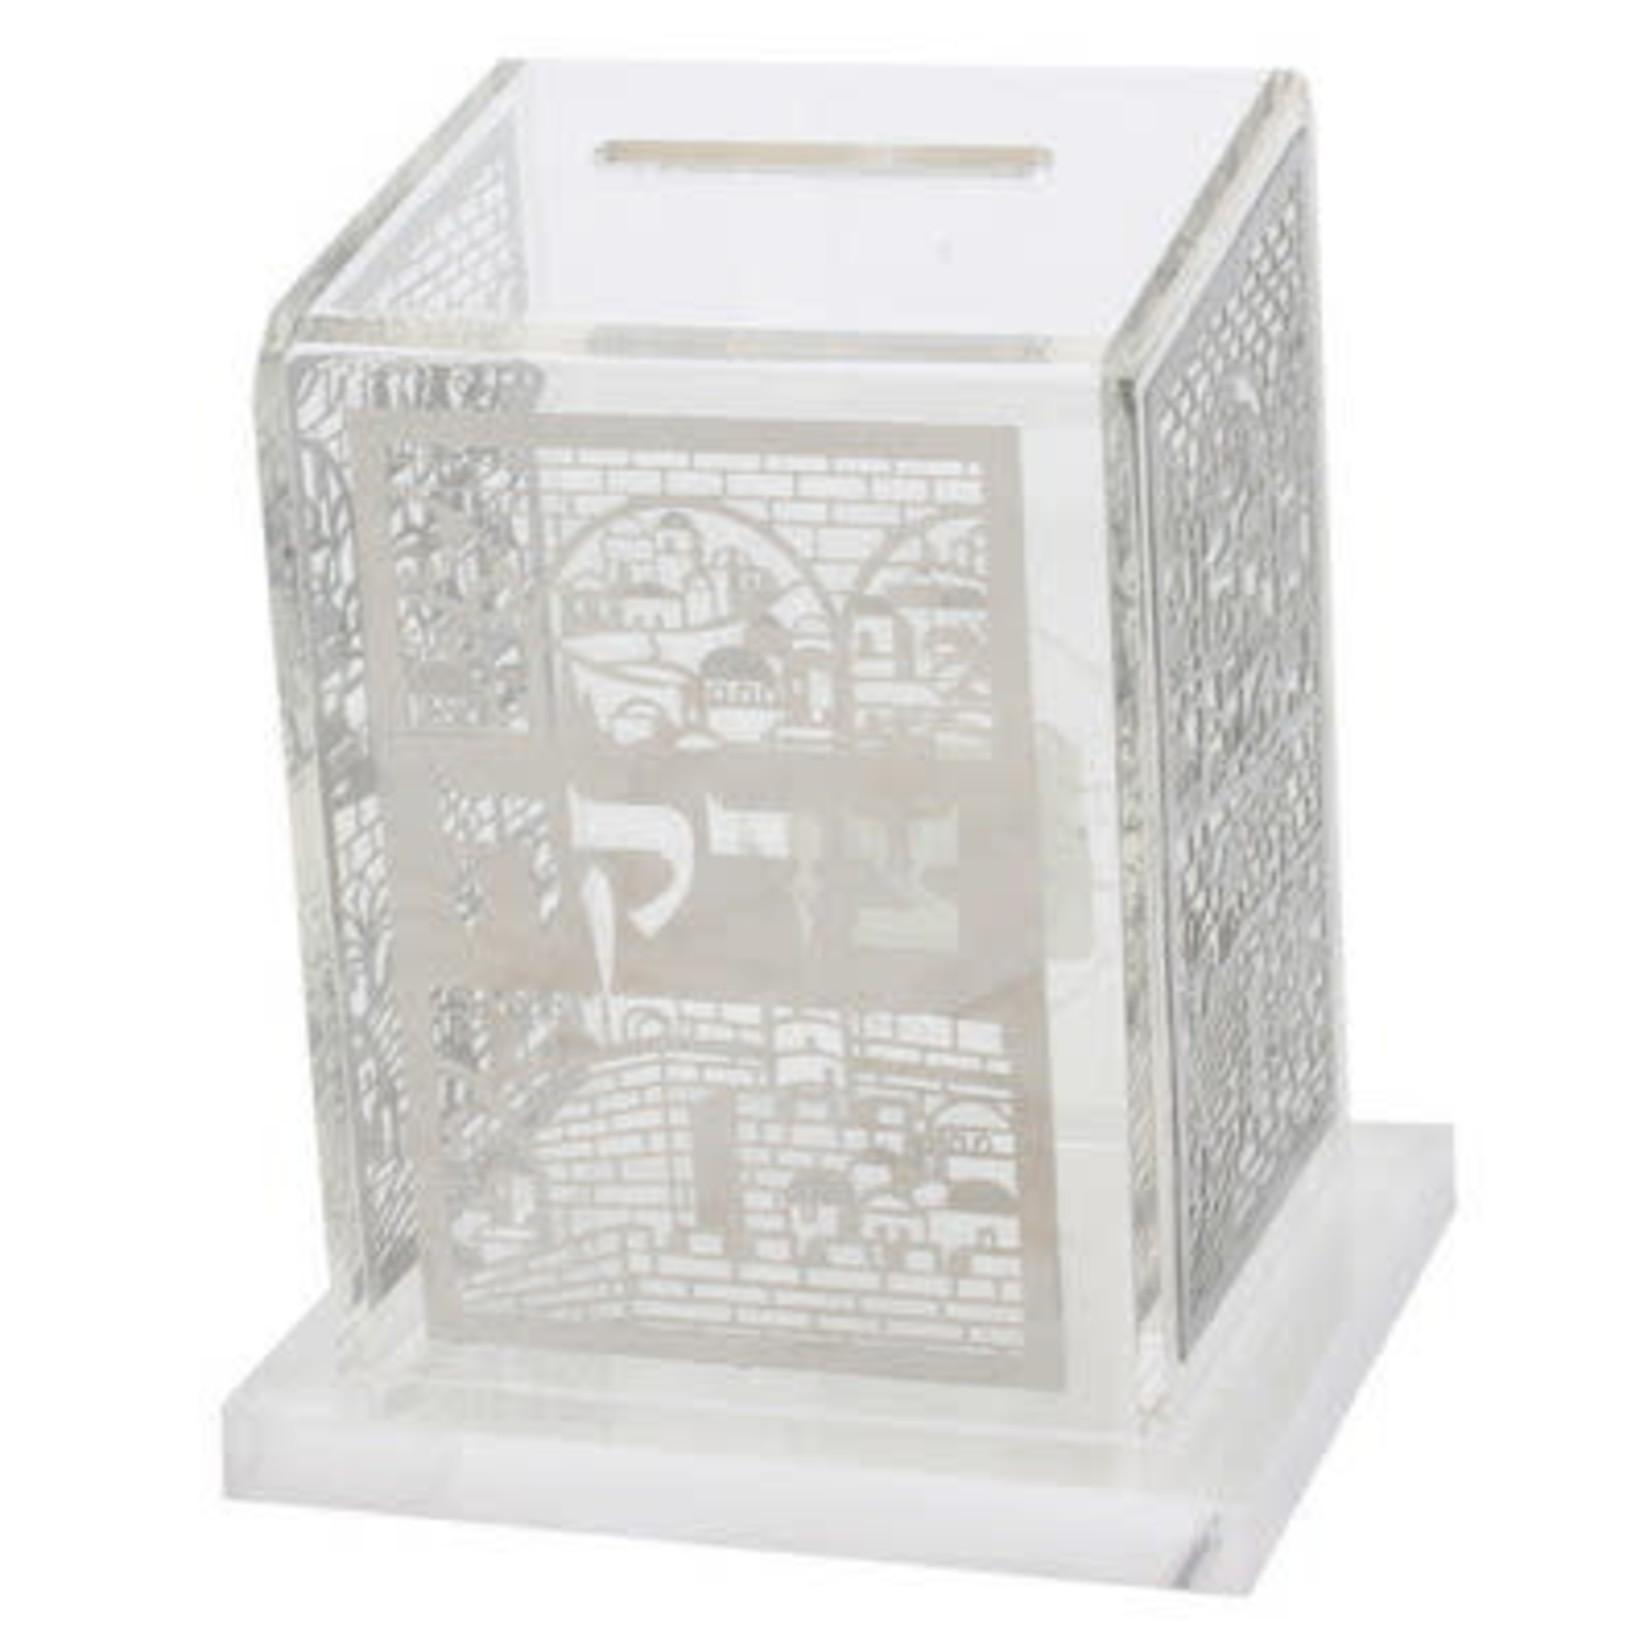 56086 Perspex Tzedakah Box 11*10 Cm With Metal Plaque